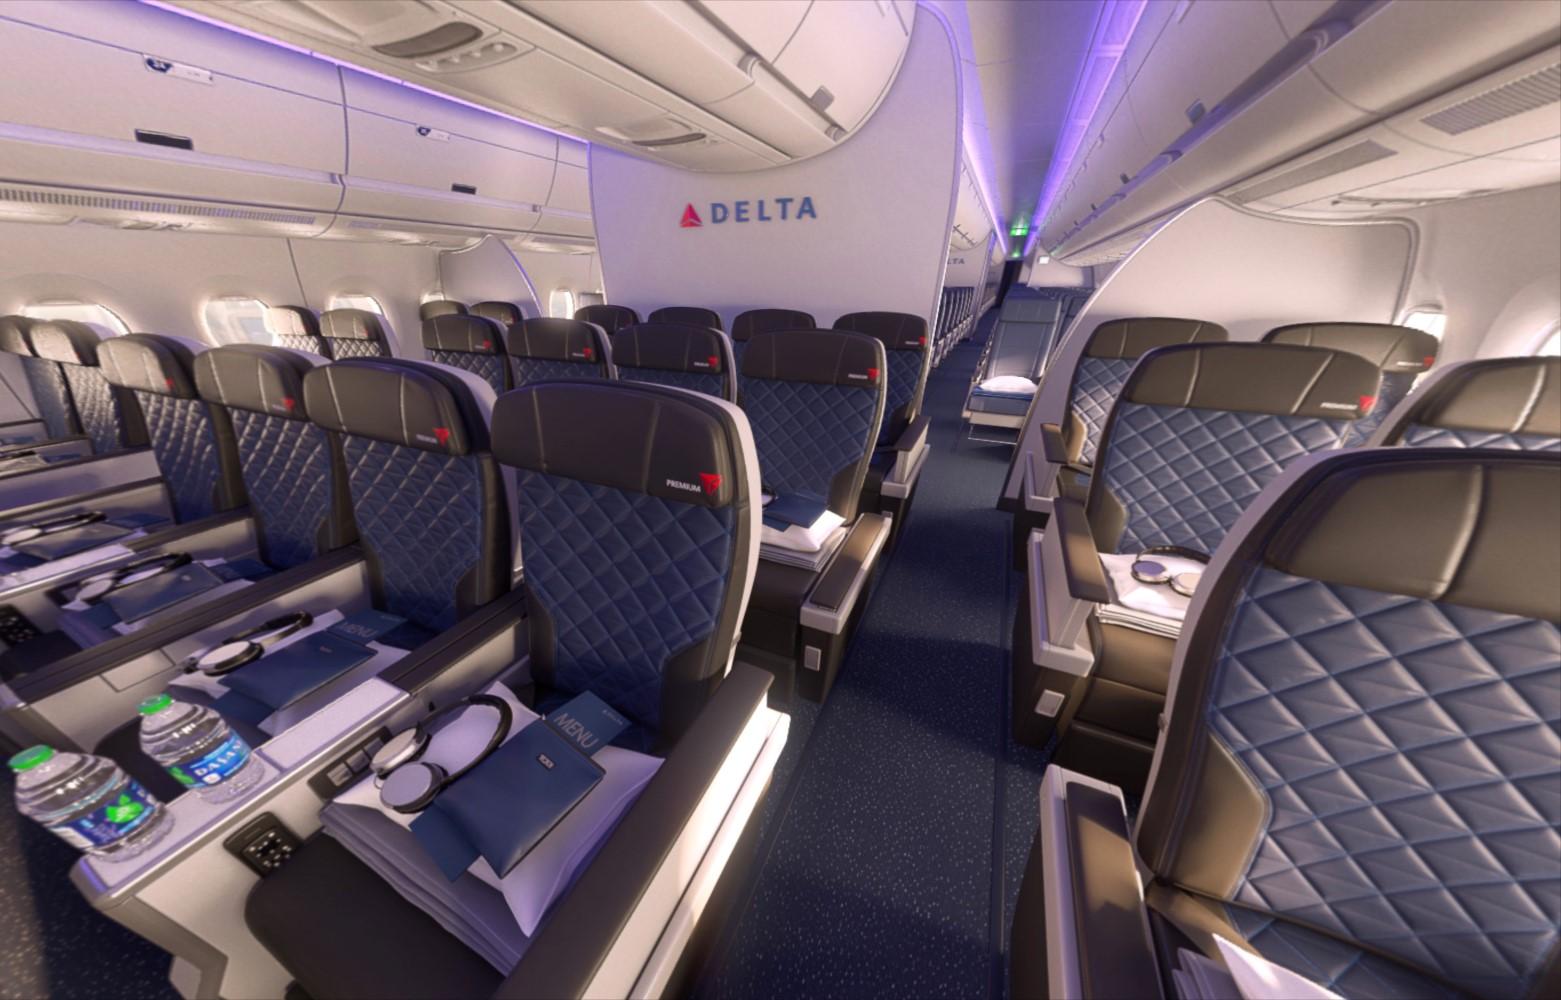 Delta Premium goes for biz-minus amenities, but average seat